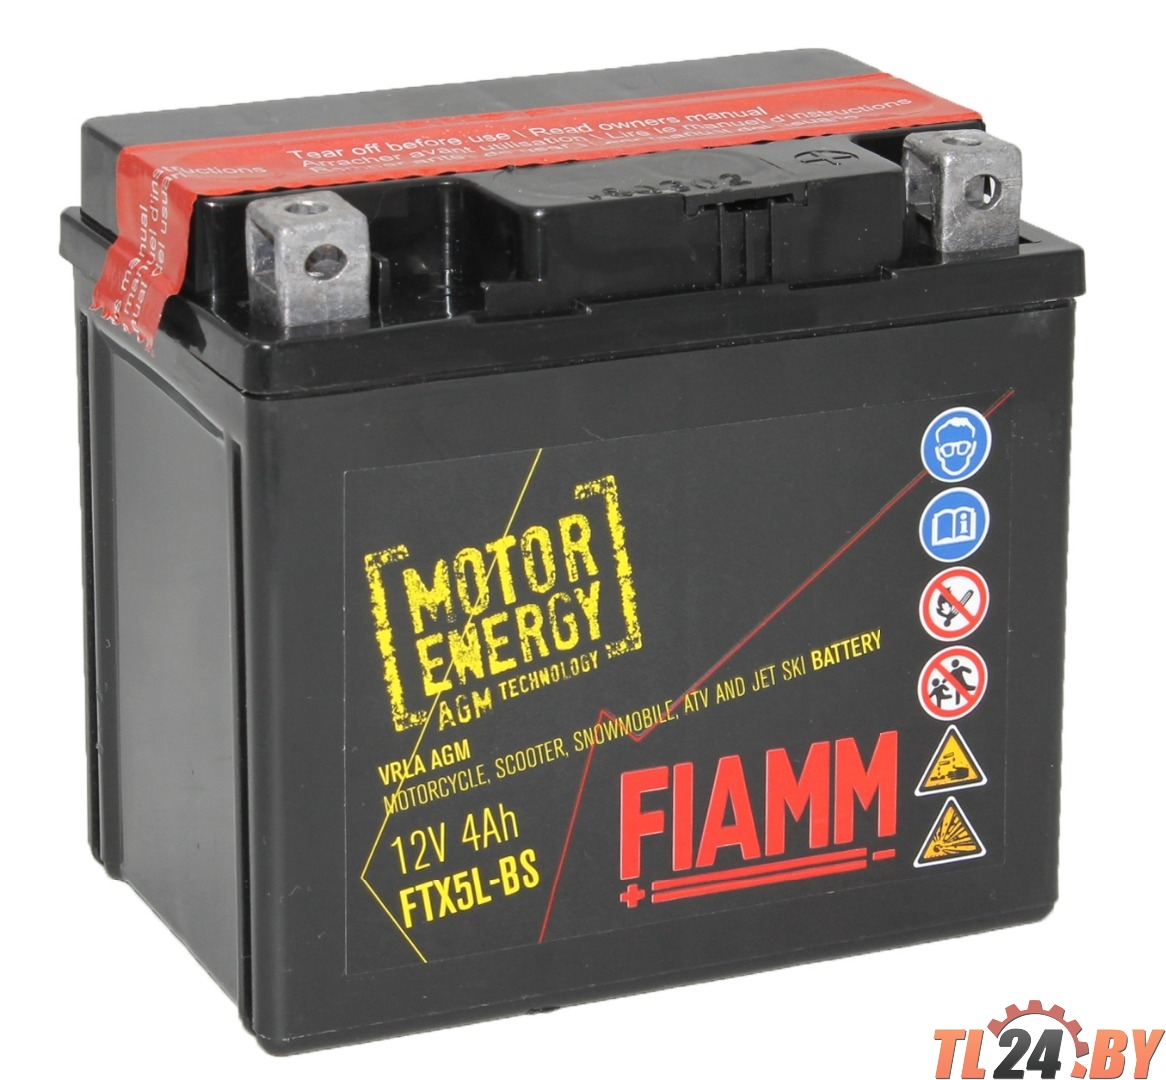 Аккумулятор Fiamm FTX5L-BS (7904476) евро 4Ah 113/70/105mm